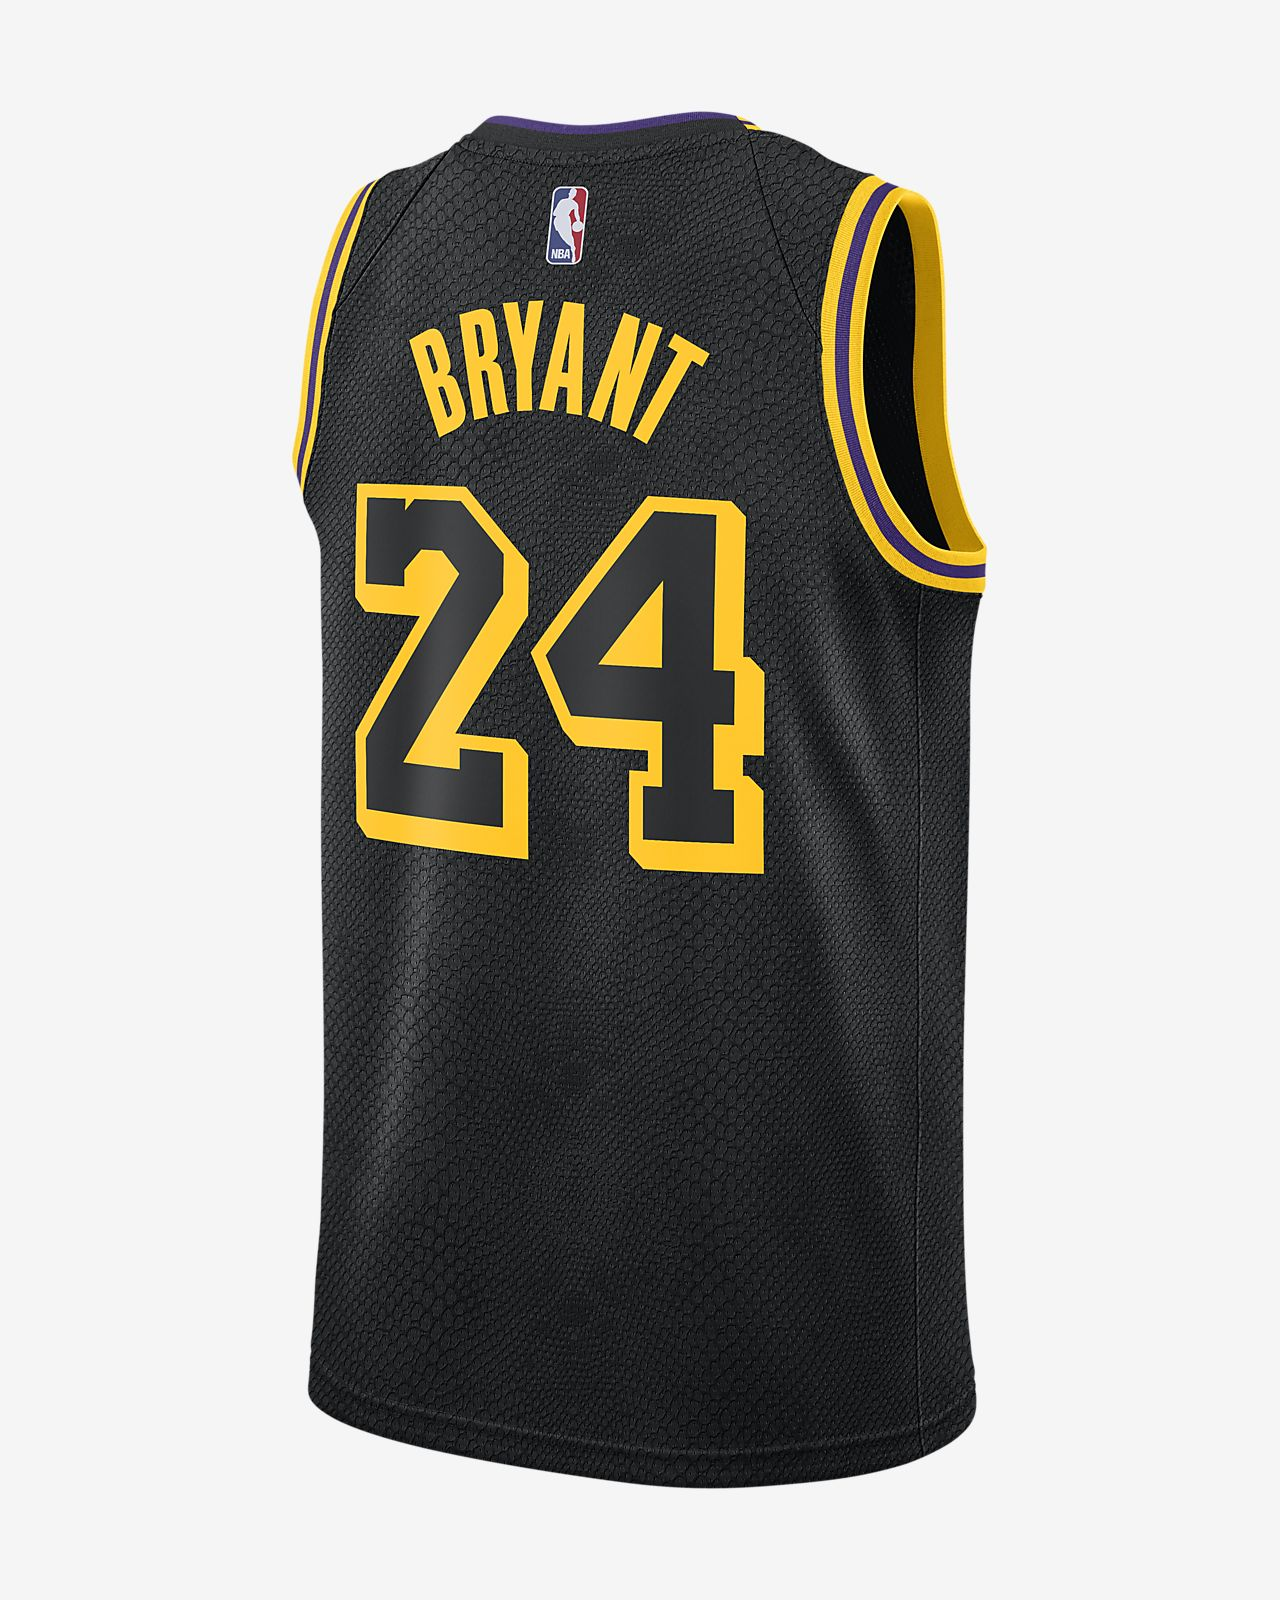 7b596e359 ... inexpensive kobe bryant city edition swingman jersey los angeles lakers  mens nike nba jersey ea904 3bc47